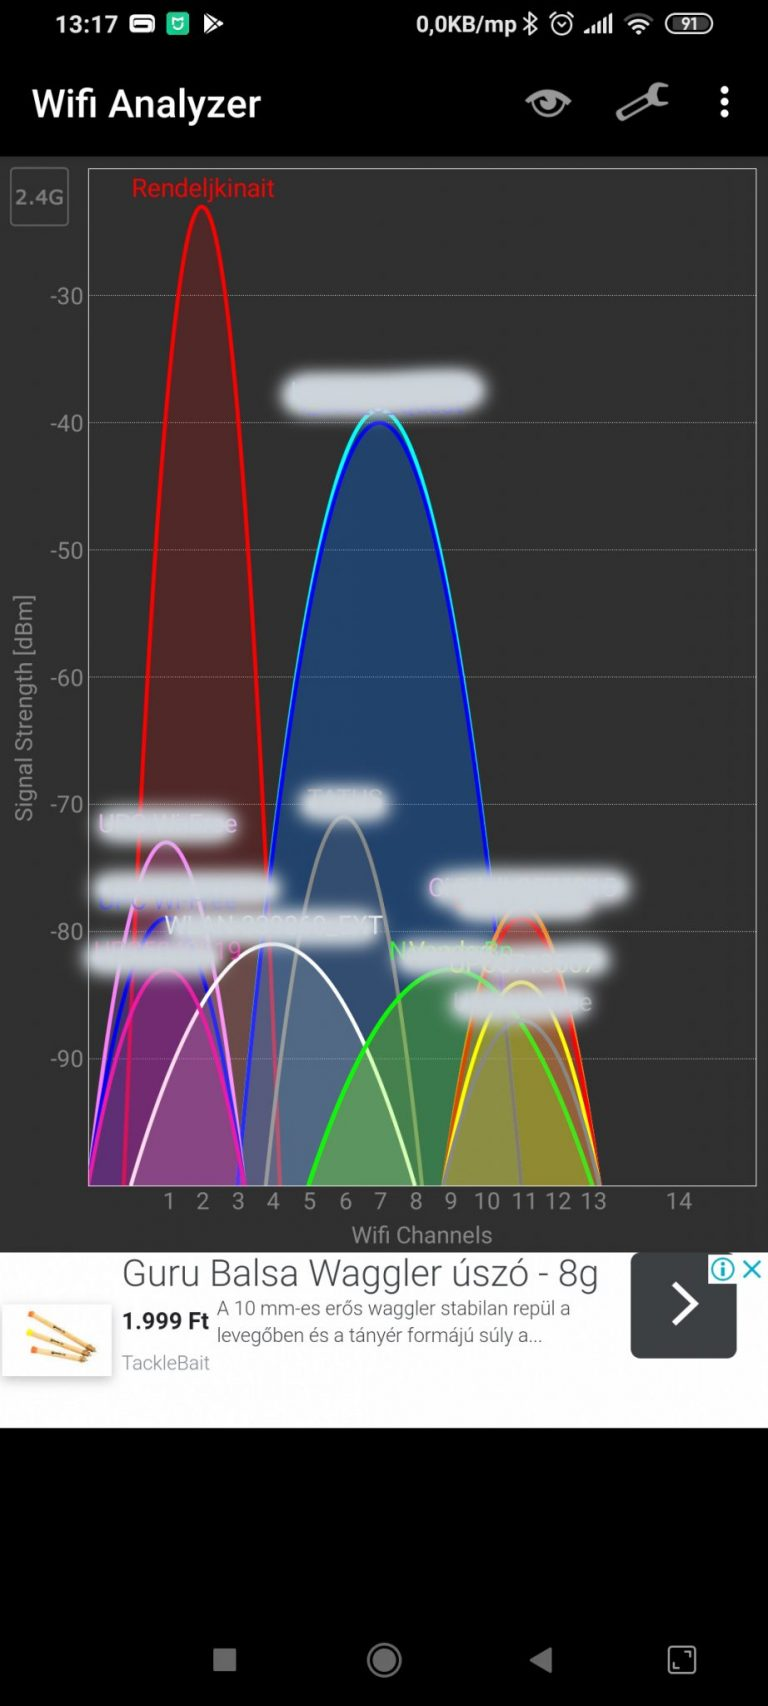 Xiaomi AX3600 router teszt 38